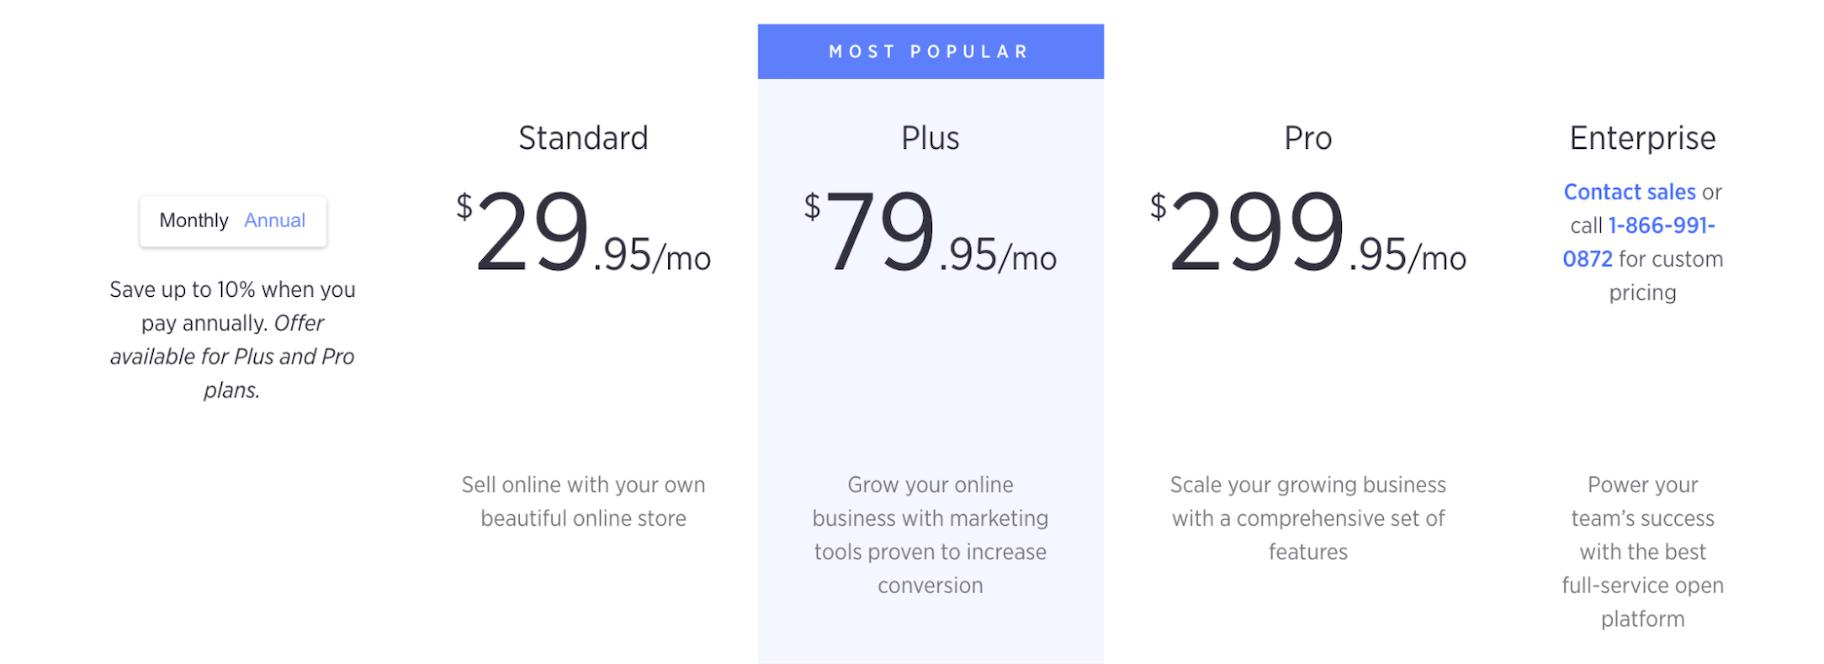 BigCommerce vs. Shopify Pricing